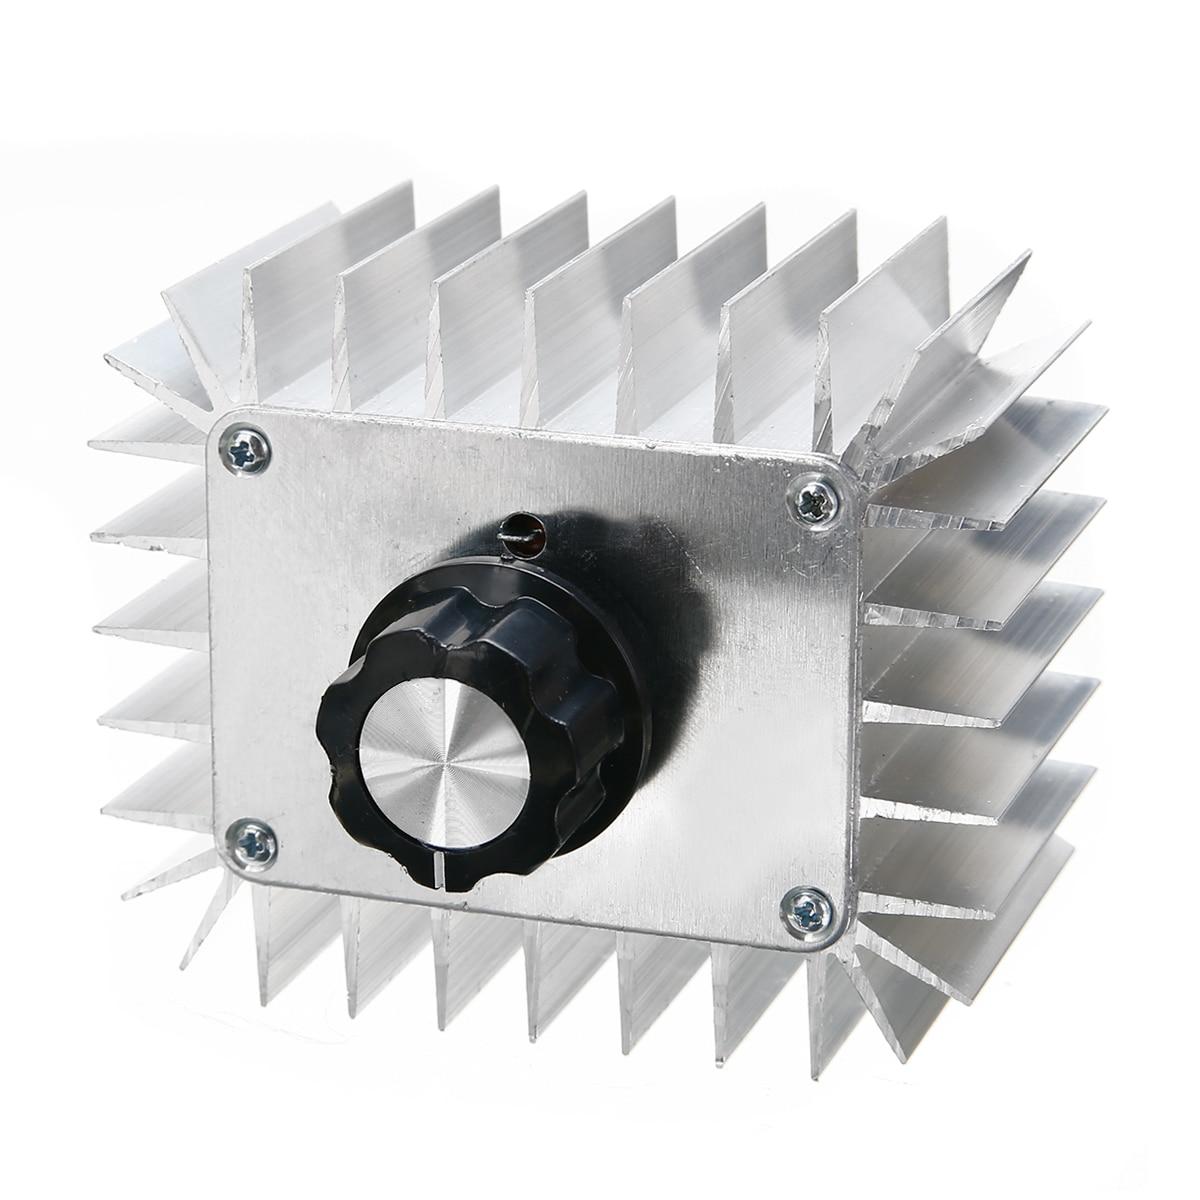 New 5000W SCR Voltage Regulator 220V AC Voltage Regulator Dimmer Electric Motor Speed Controller 85x70x42mm